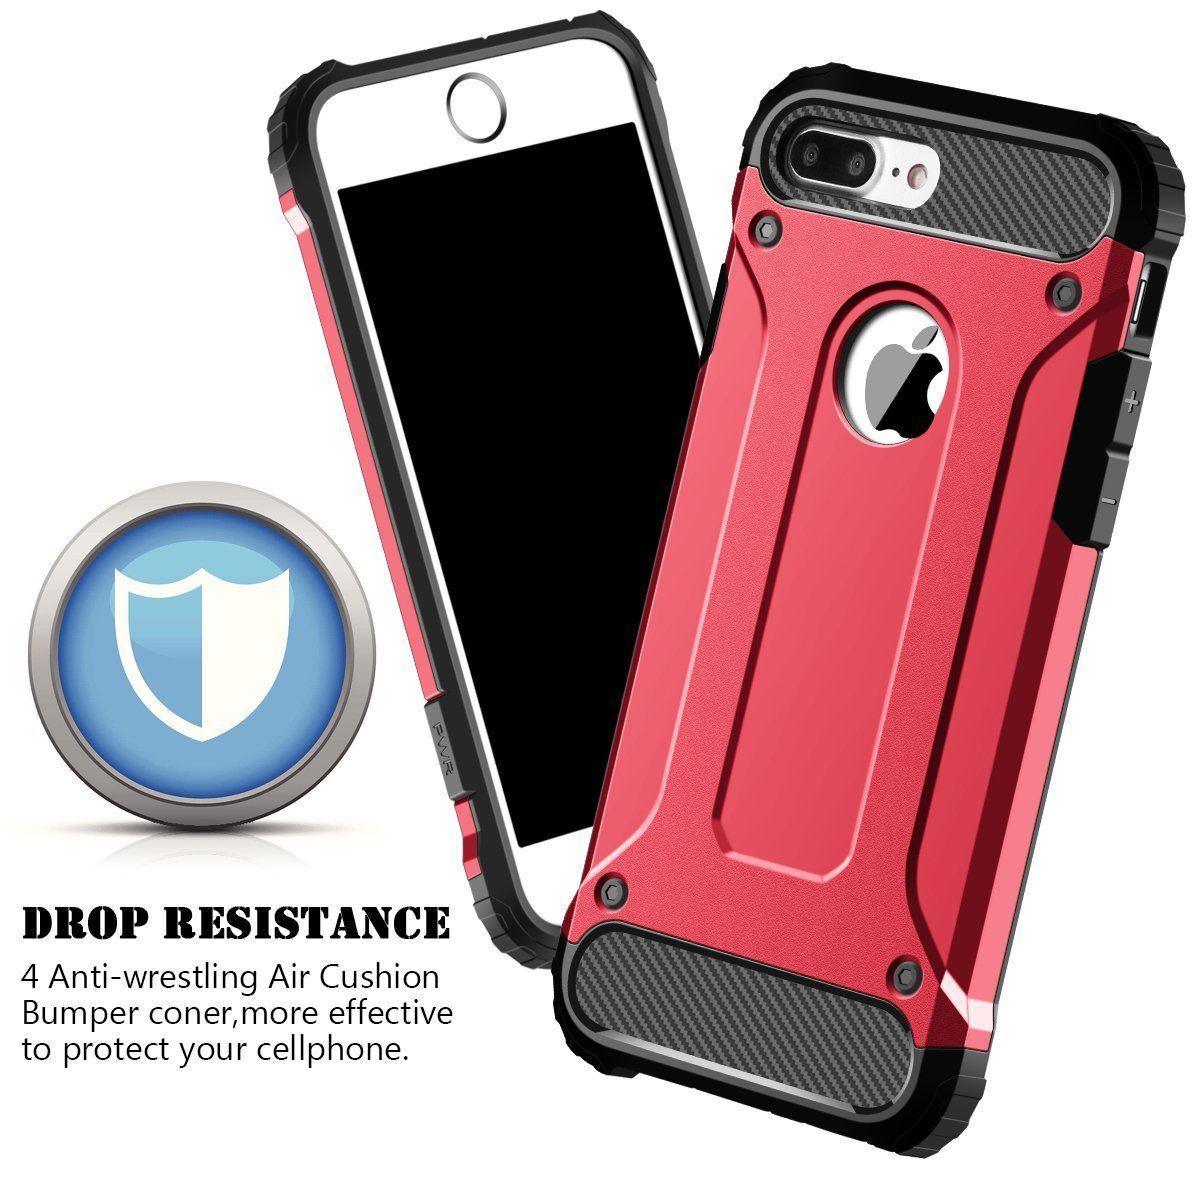 thumbnail 34 - For Apple iPhone 11 Pro Max XR Xs X 8 7 Plus 6 5 Se Case Cover Tough Armor